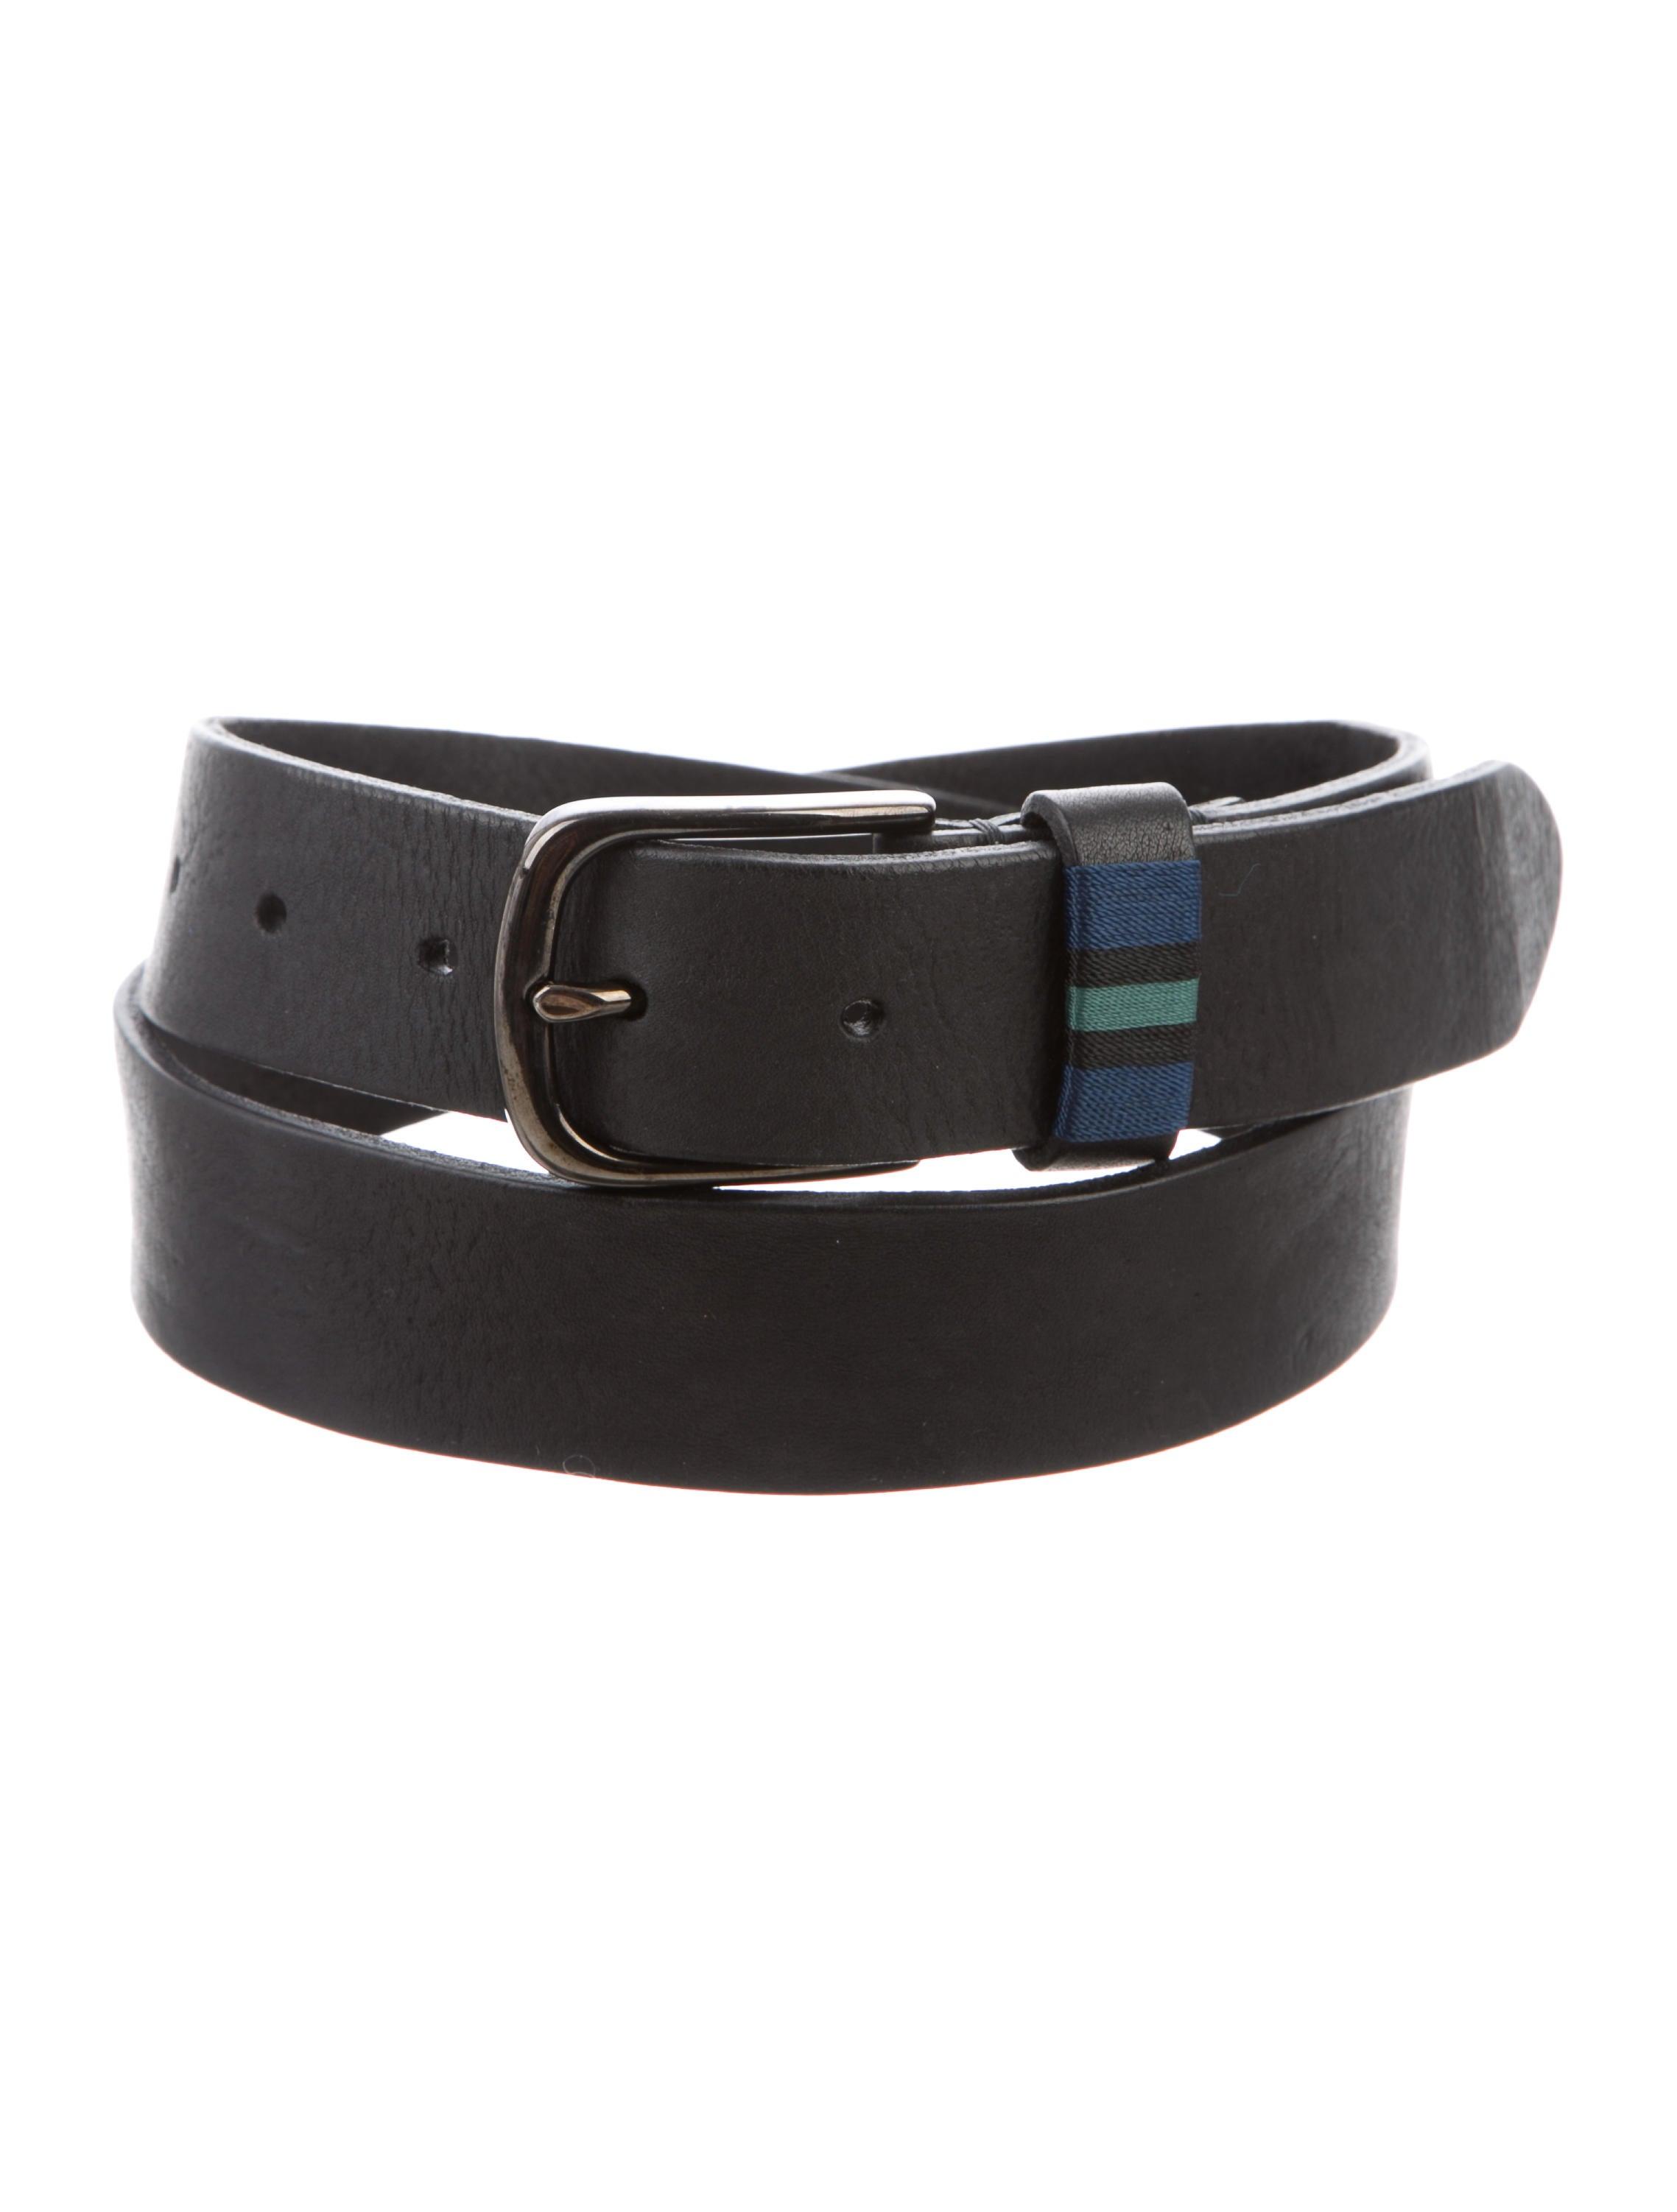 530af3d4adad Tommy Hilfiger Leather Buckle Belt - Accessories - WTM20106